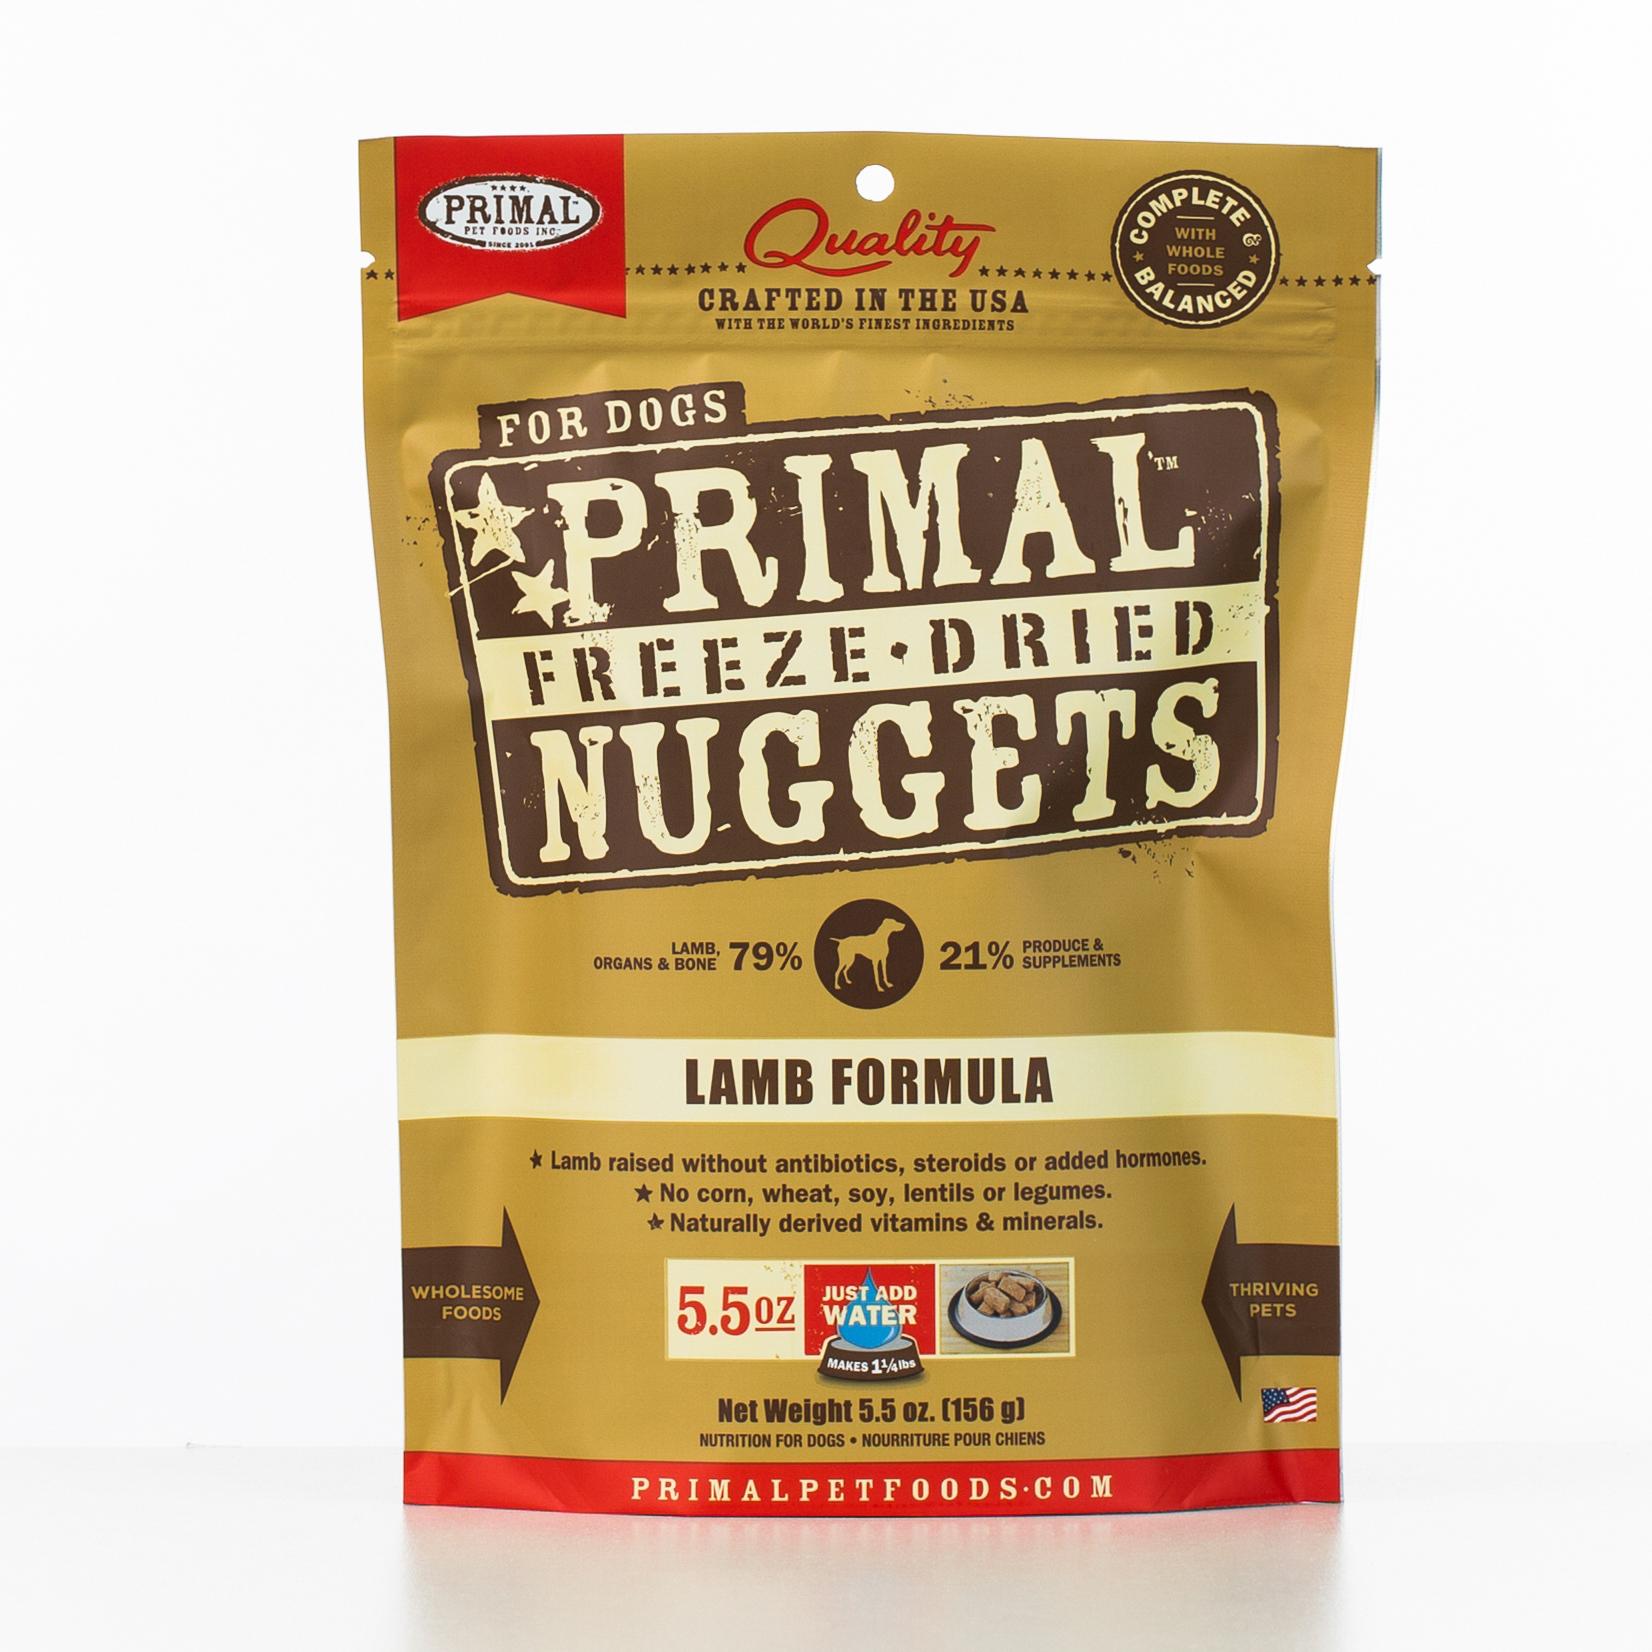 Primal Raw Freeze-Dried Nuggets Lamb Formula Dog Food, 5.5-oz bag